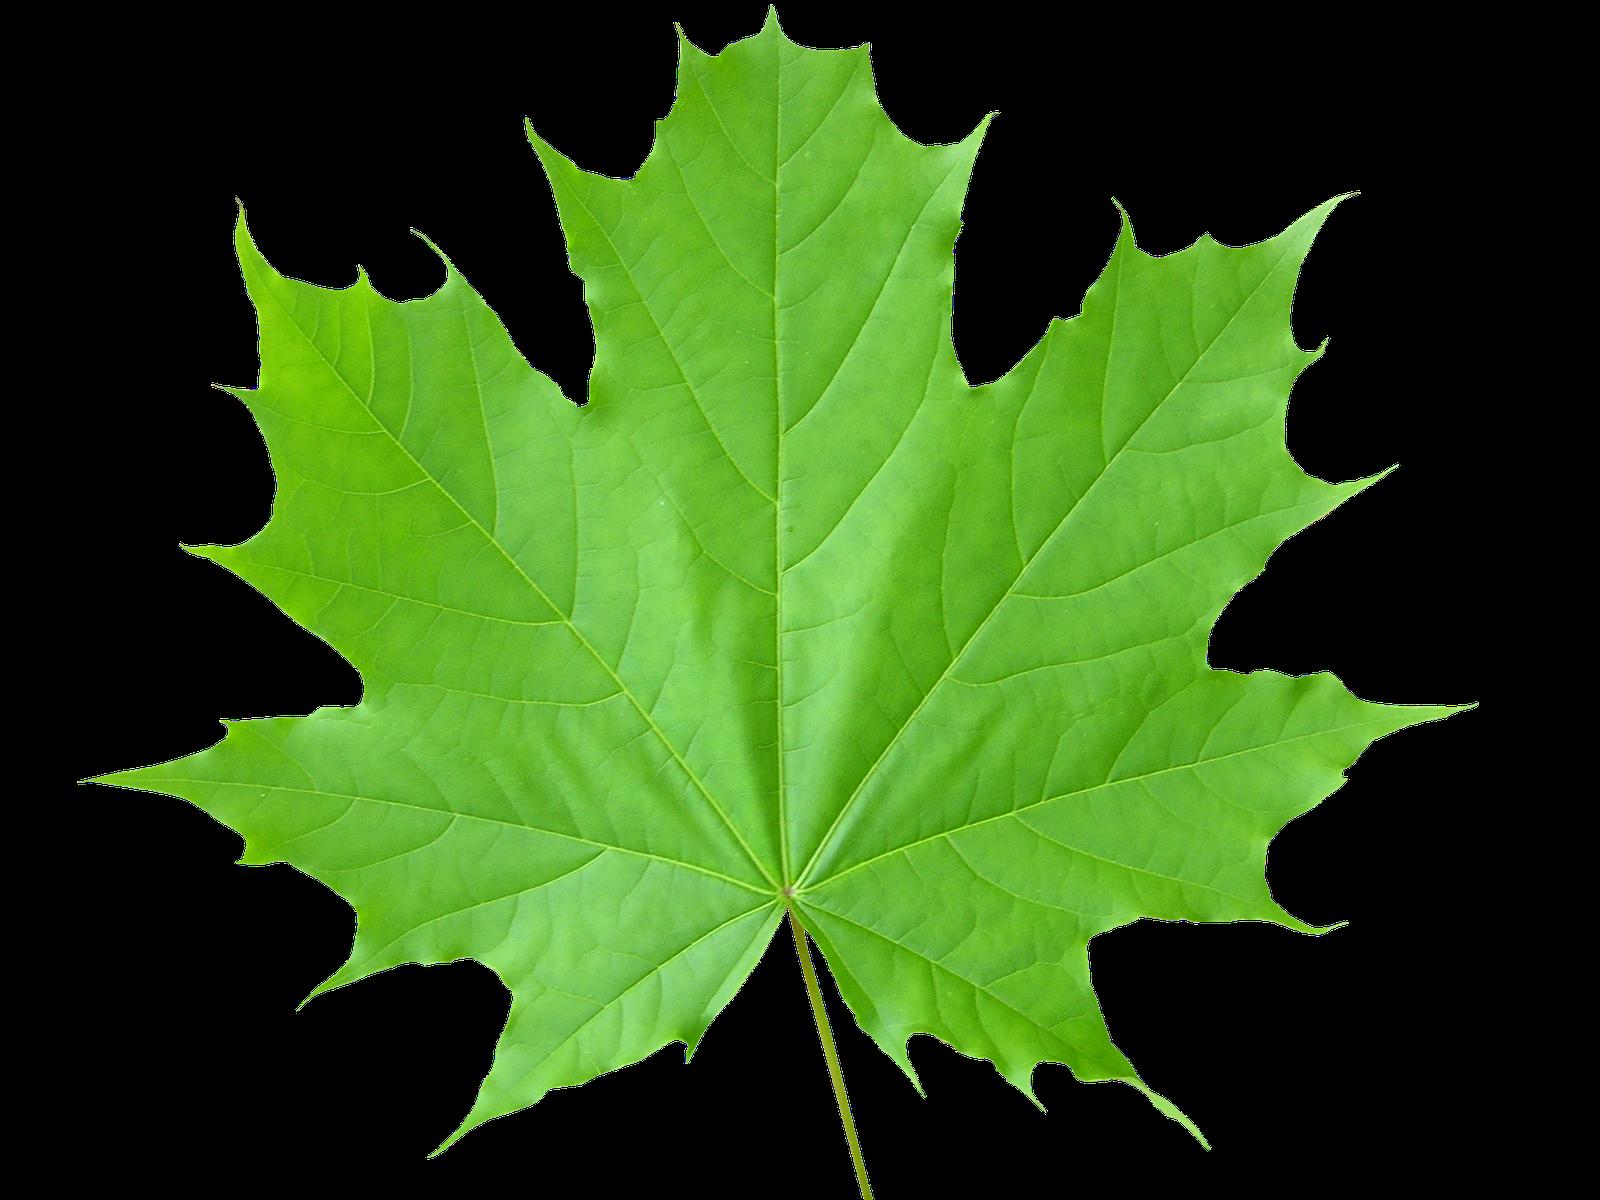 Eggplant clipart leaf. Green leaves three isolated